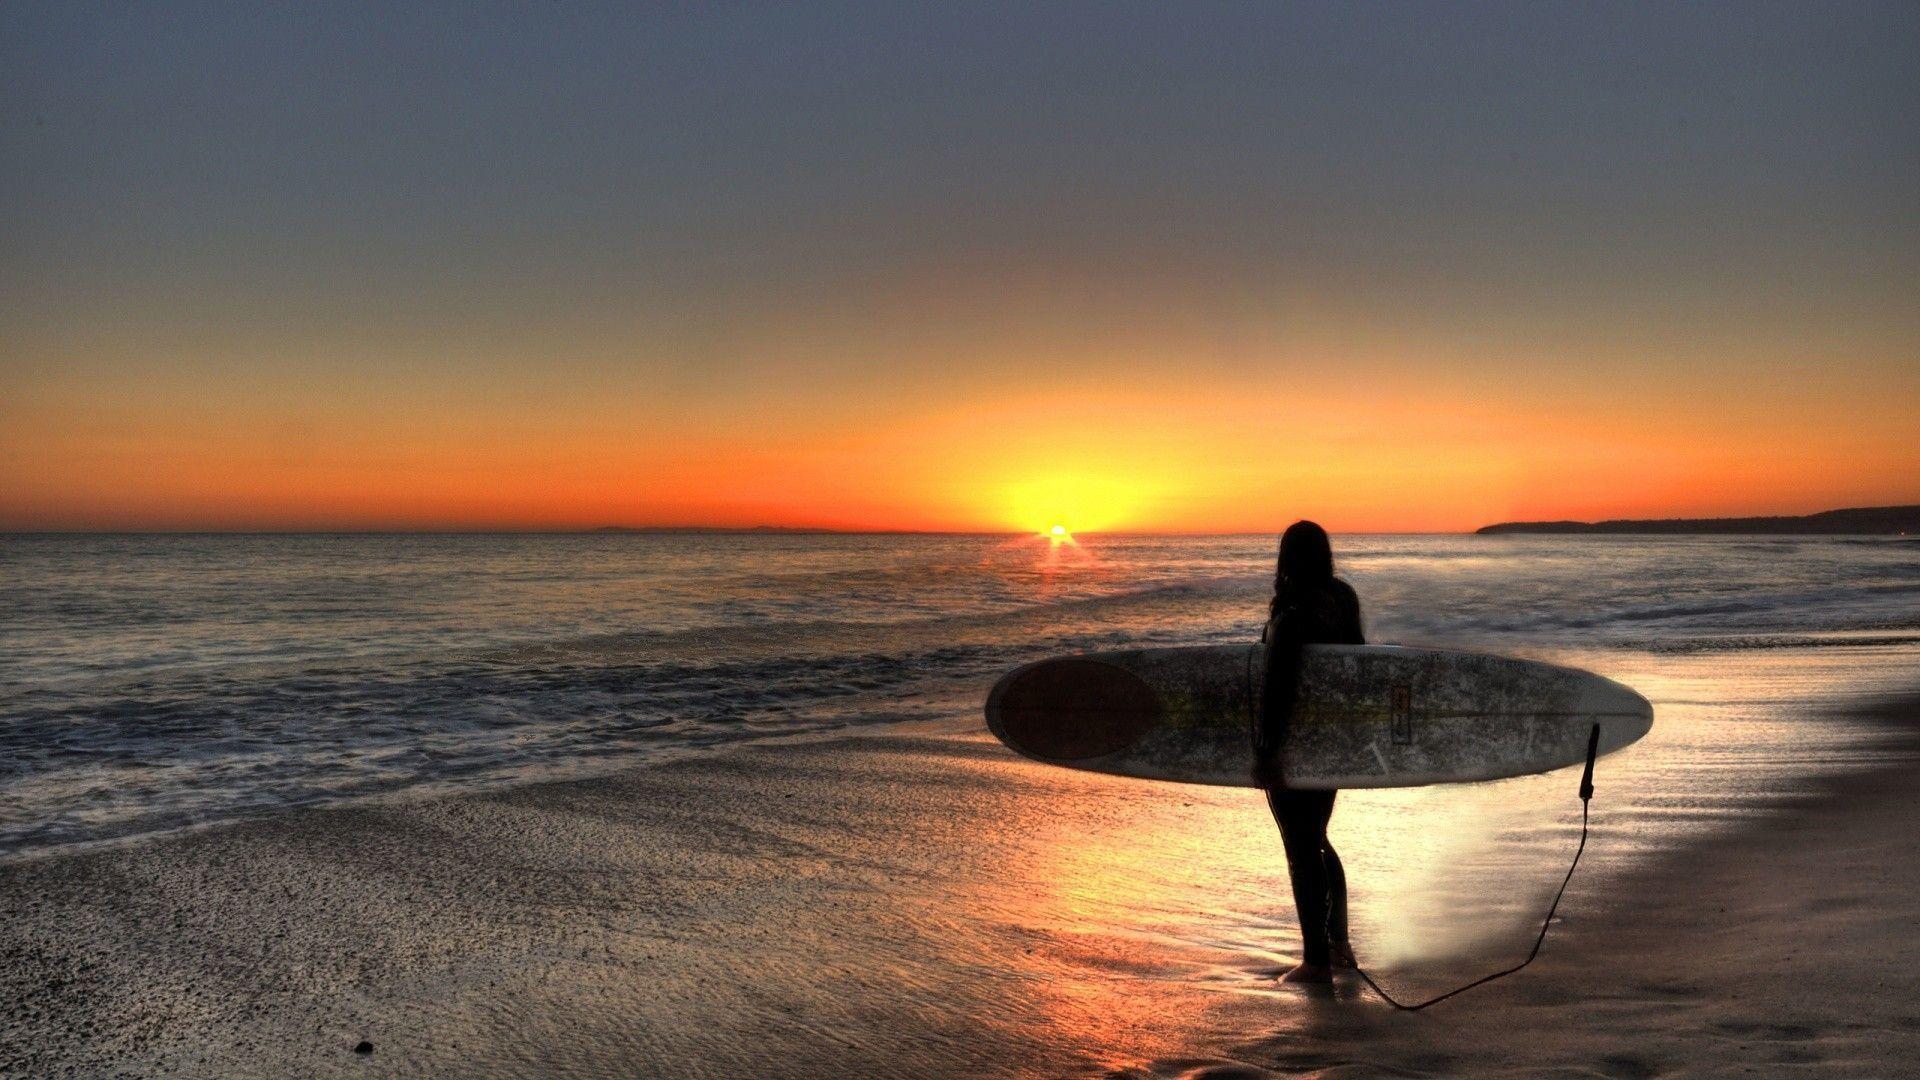 Res: 1920x1080, Sport: Sunset Surfer Beach, surfer haircut, surfer's journal .